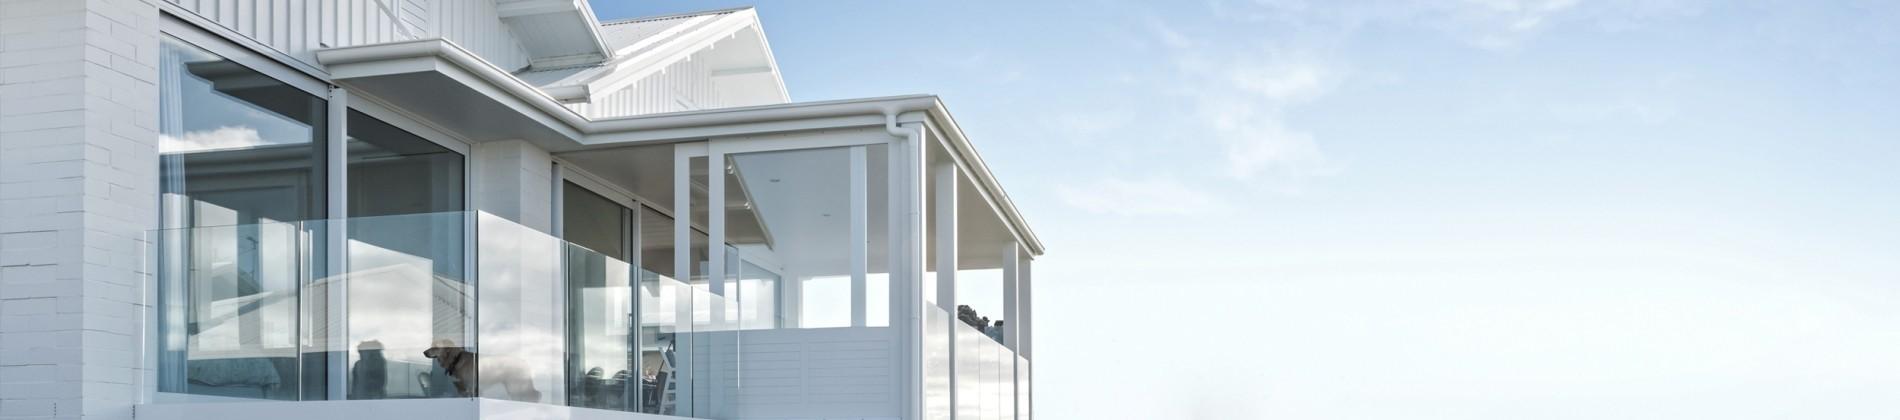 configurateur goutti re habillage de d bord de toit nicoll. Black Bedroom Furniture Sets. Home Design Ideas